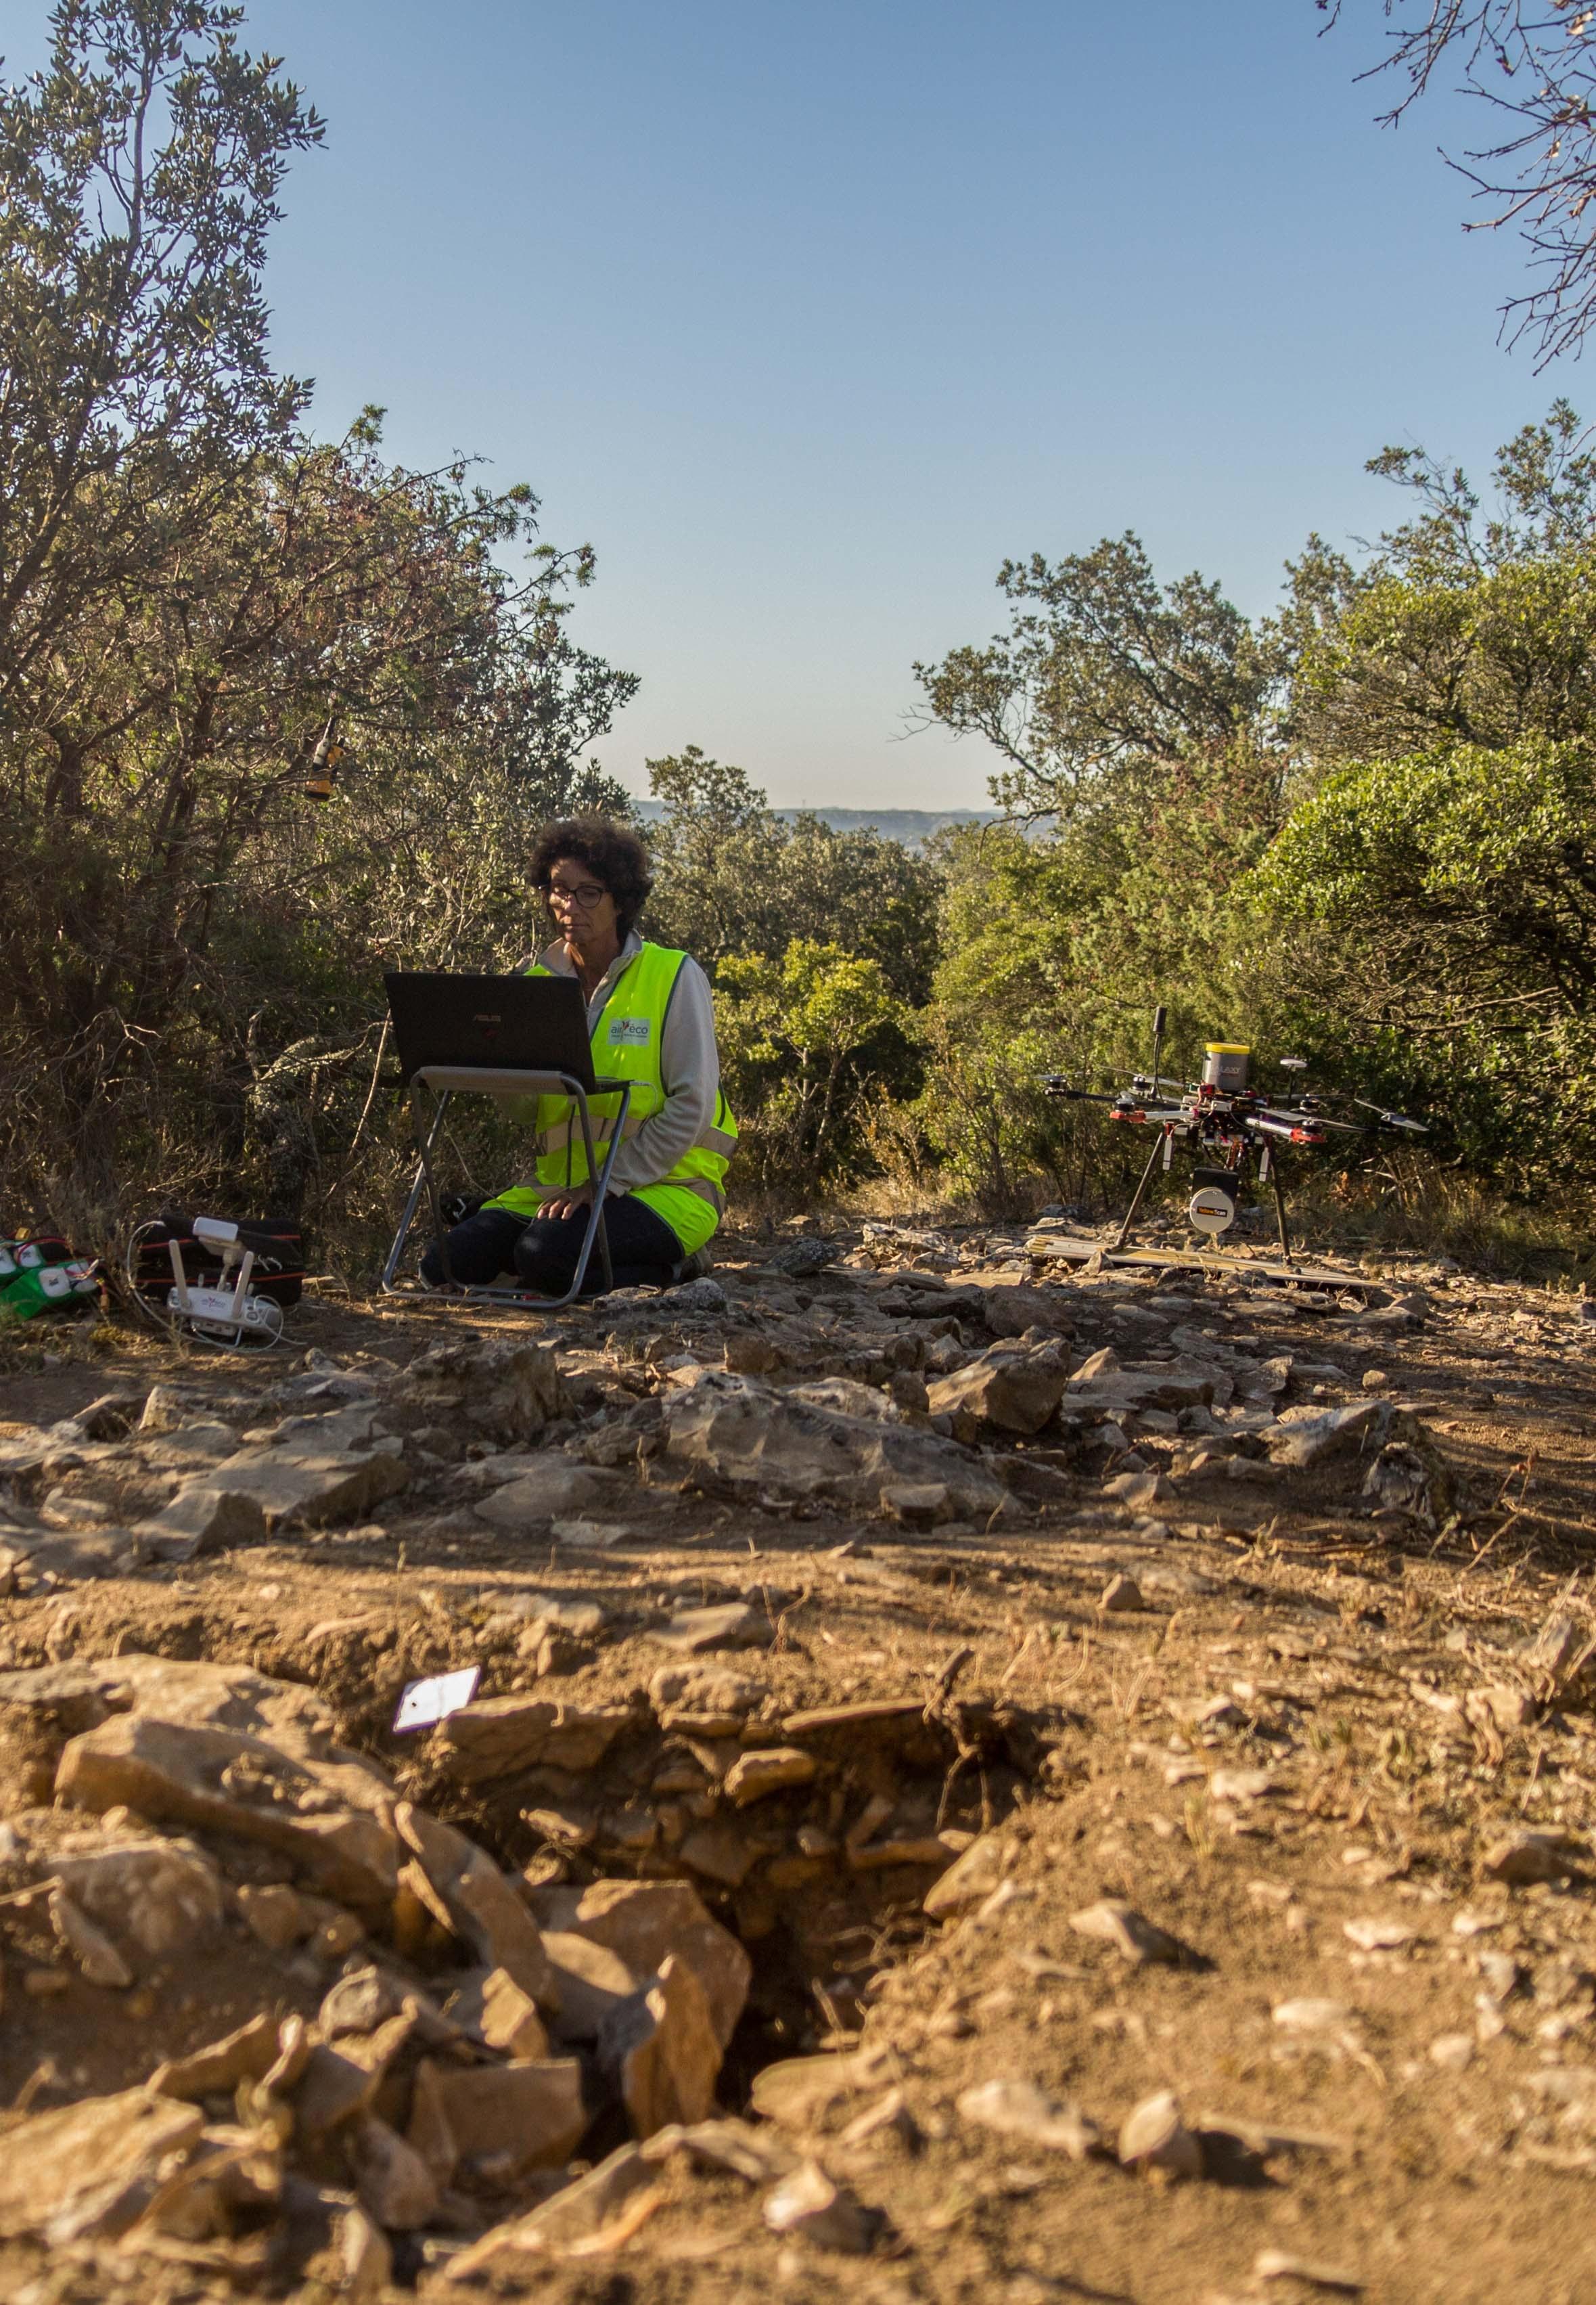 lidar-topographie-imagerie-aerienne-archéologie